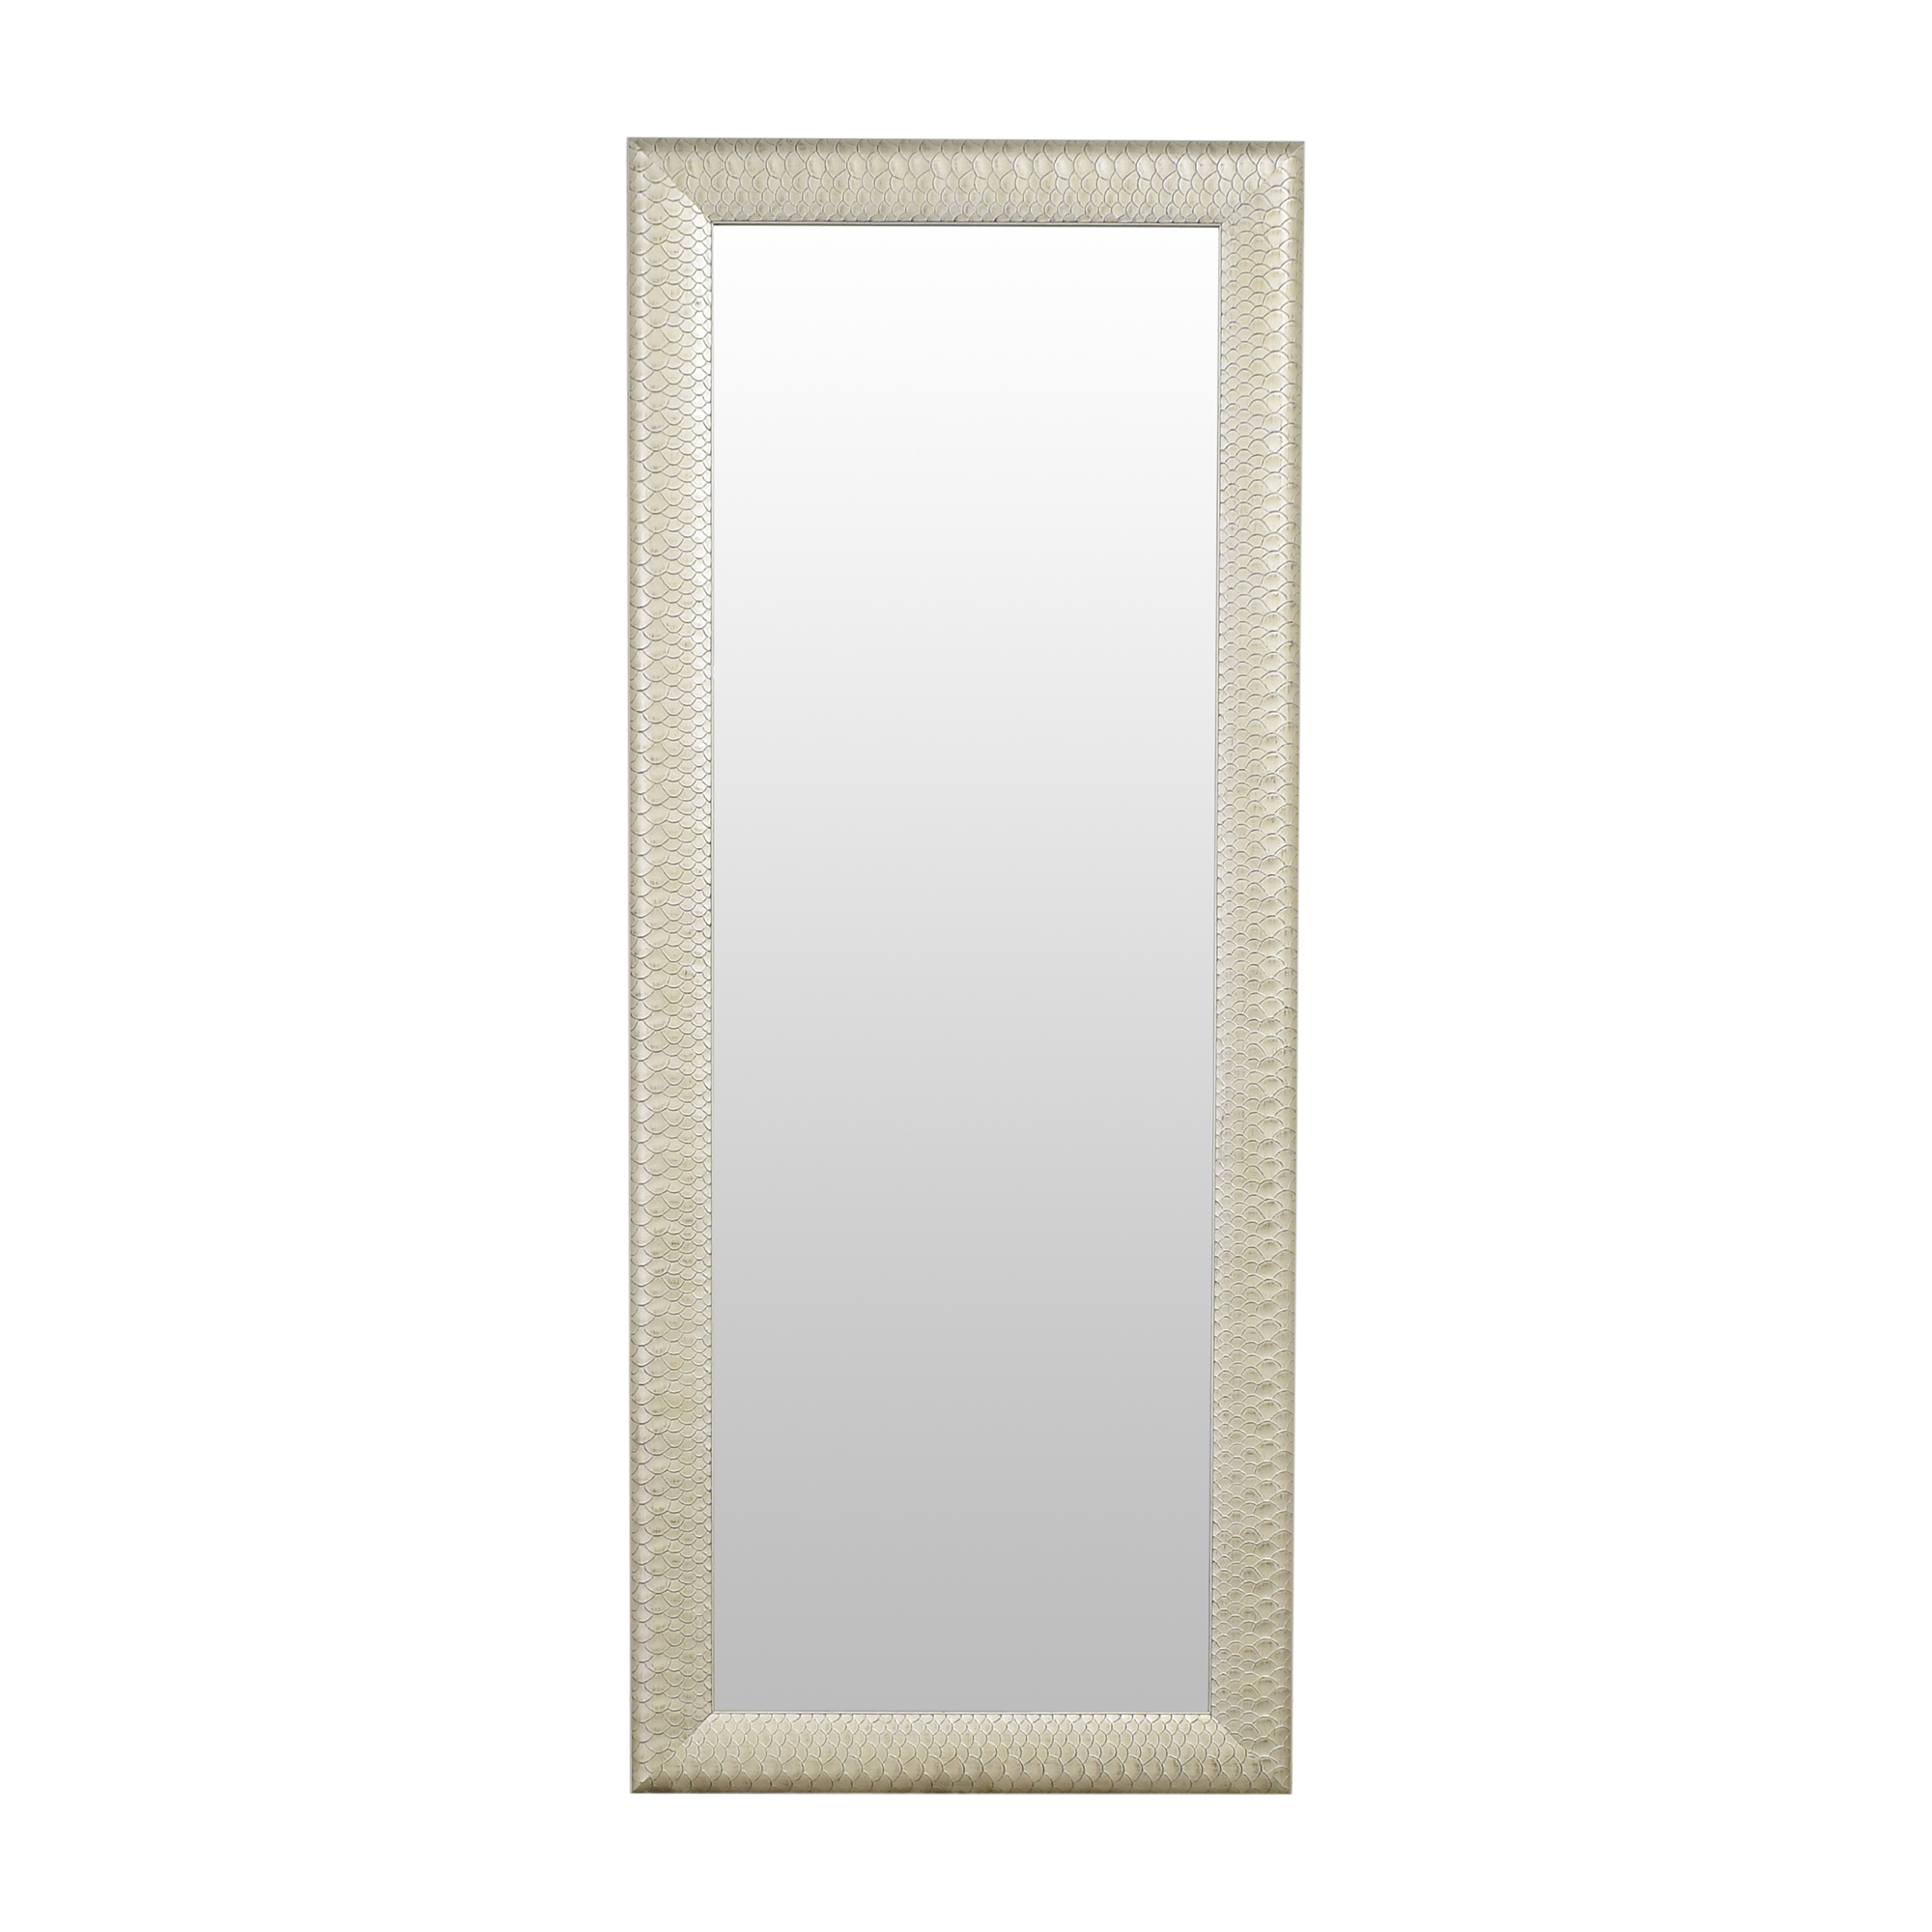 Wayfair Wayfair Tall Framed Mirror Mirrors